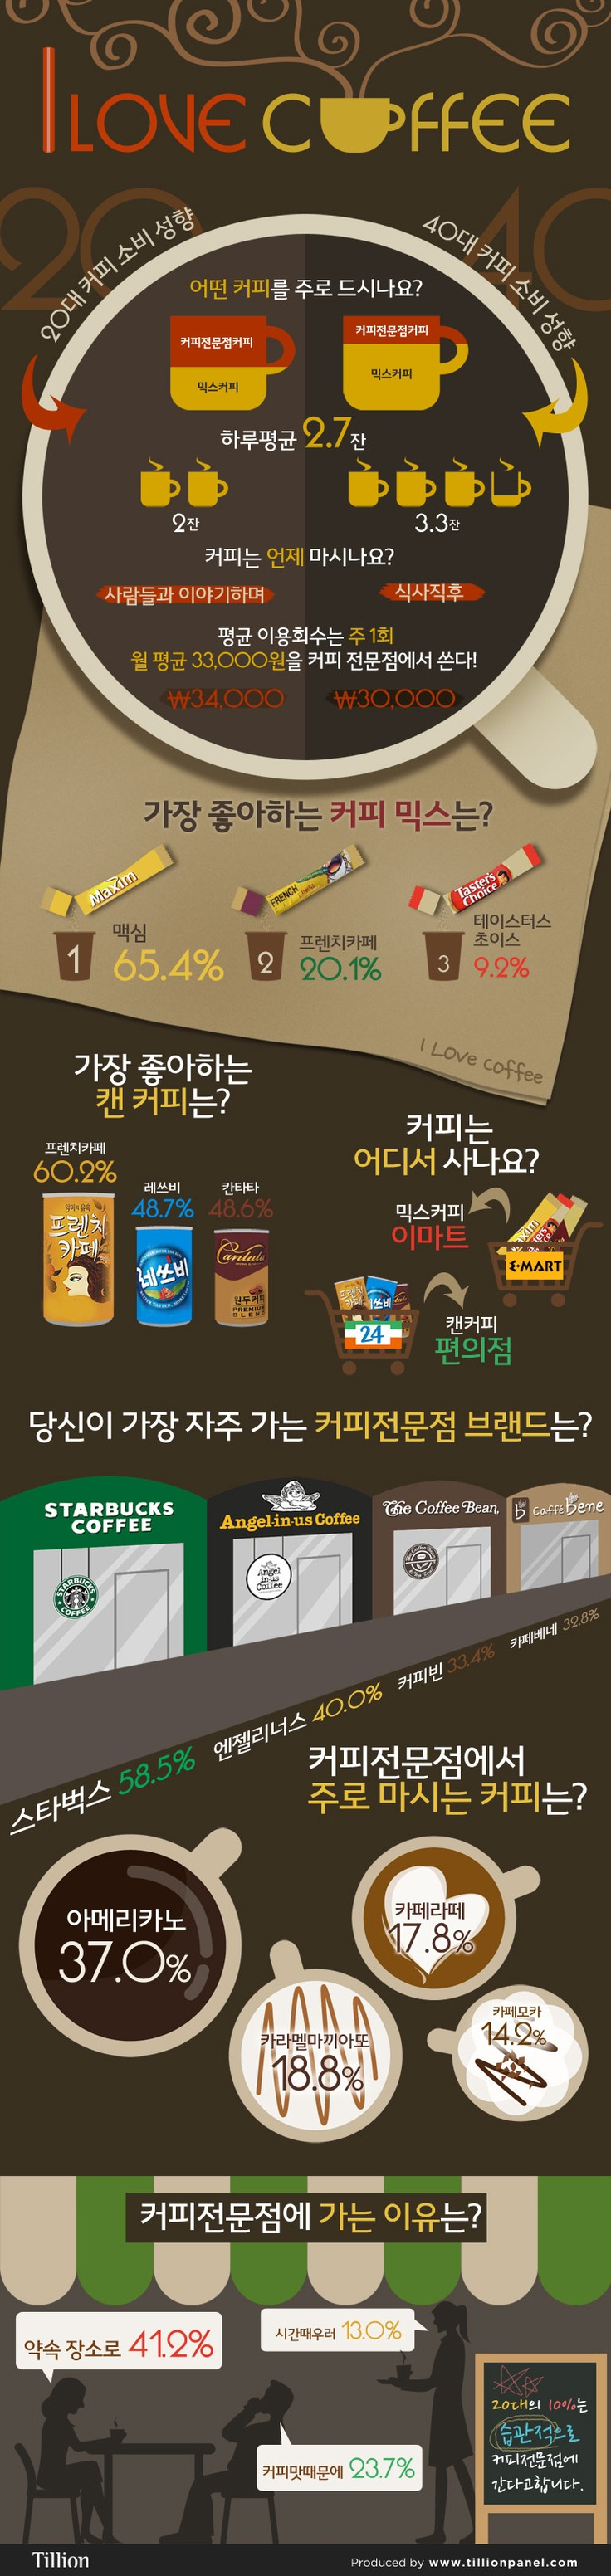 I Loooove Coffree! Favorite coffee in Kore…